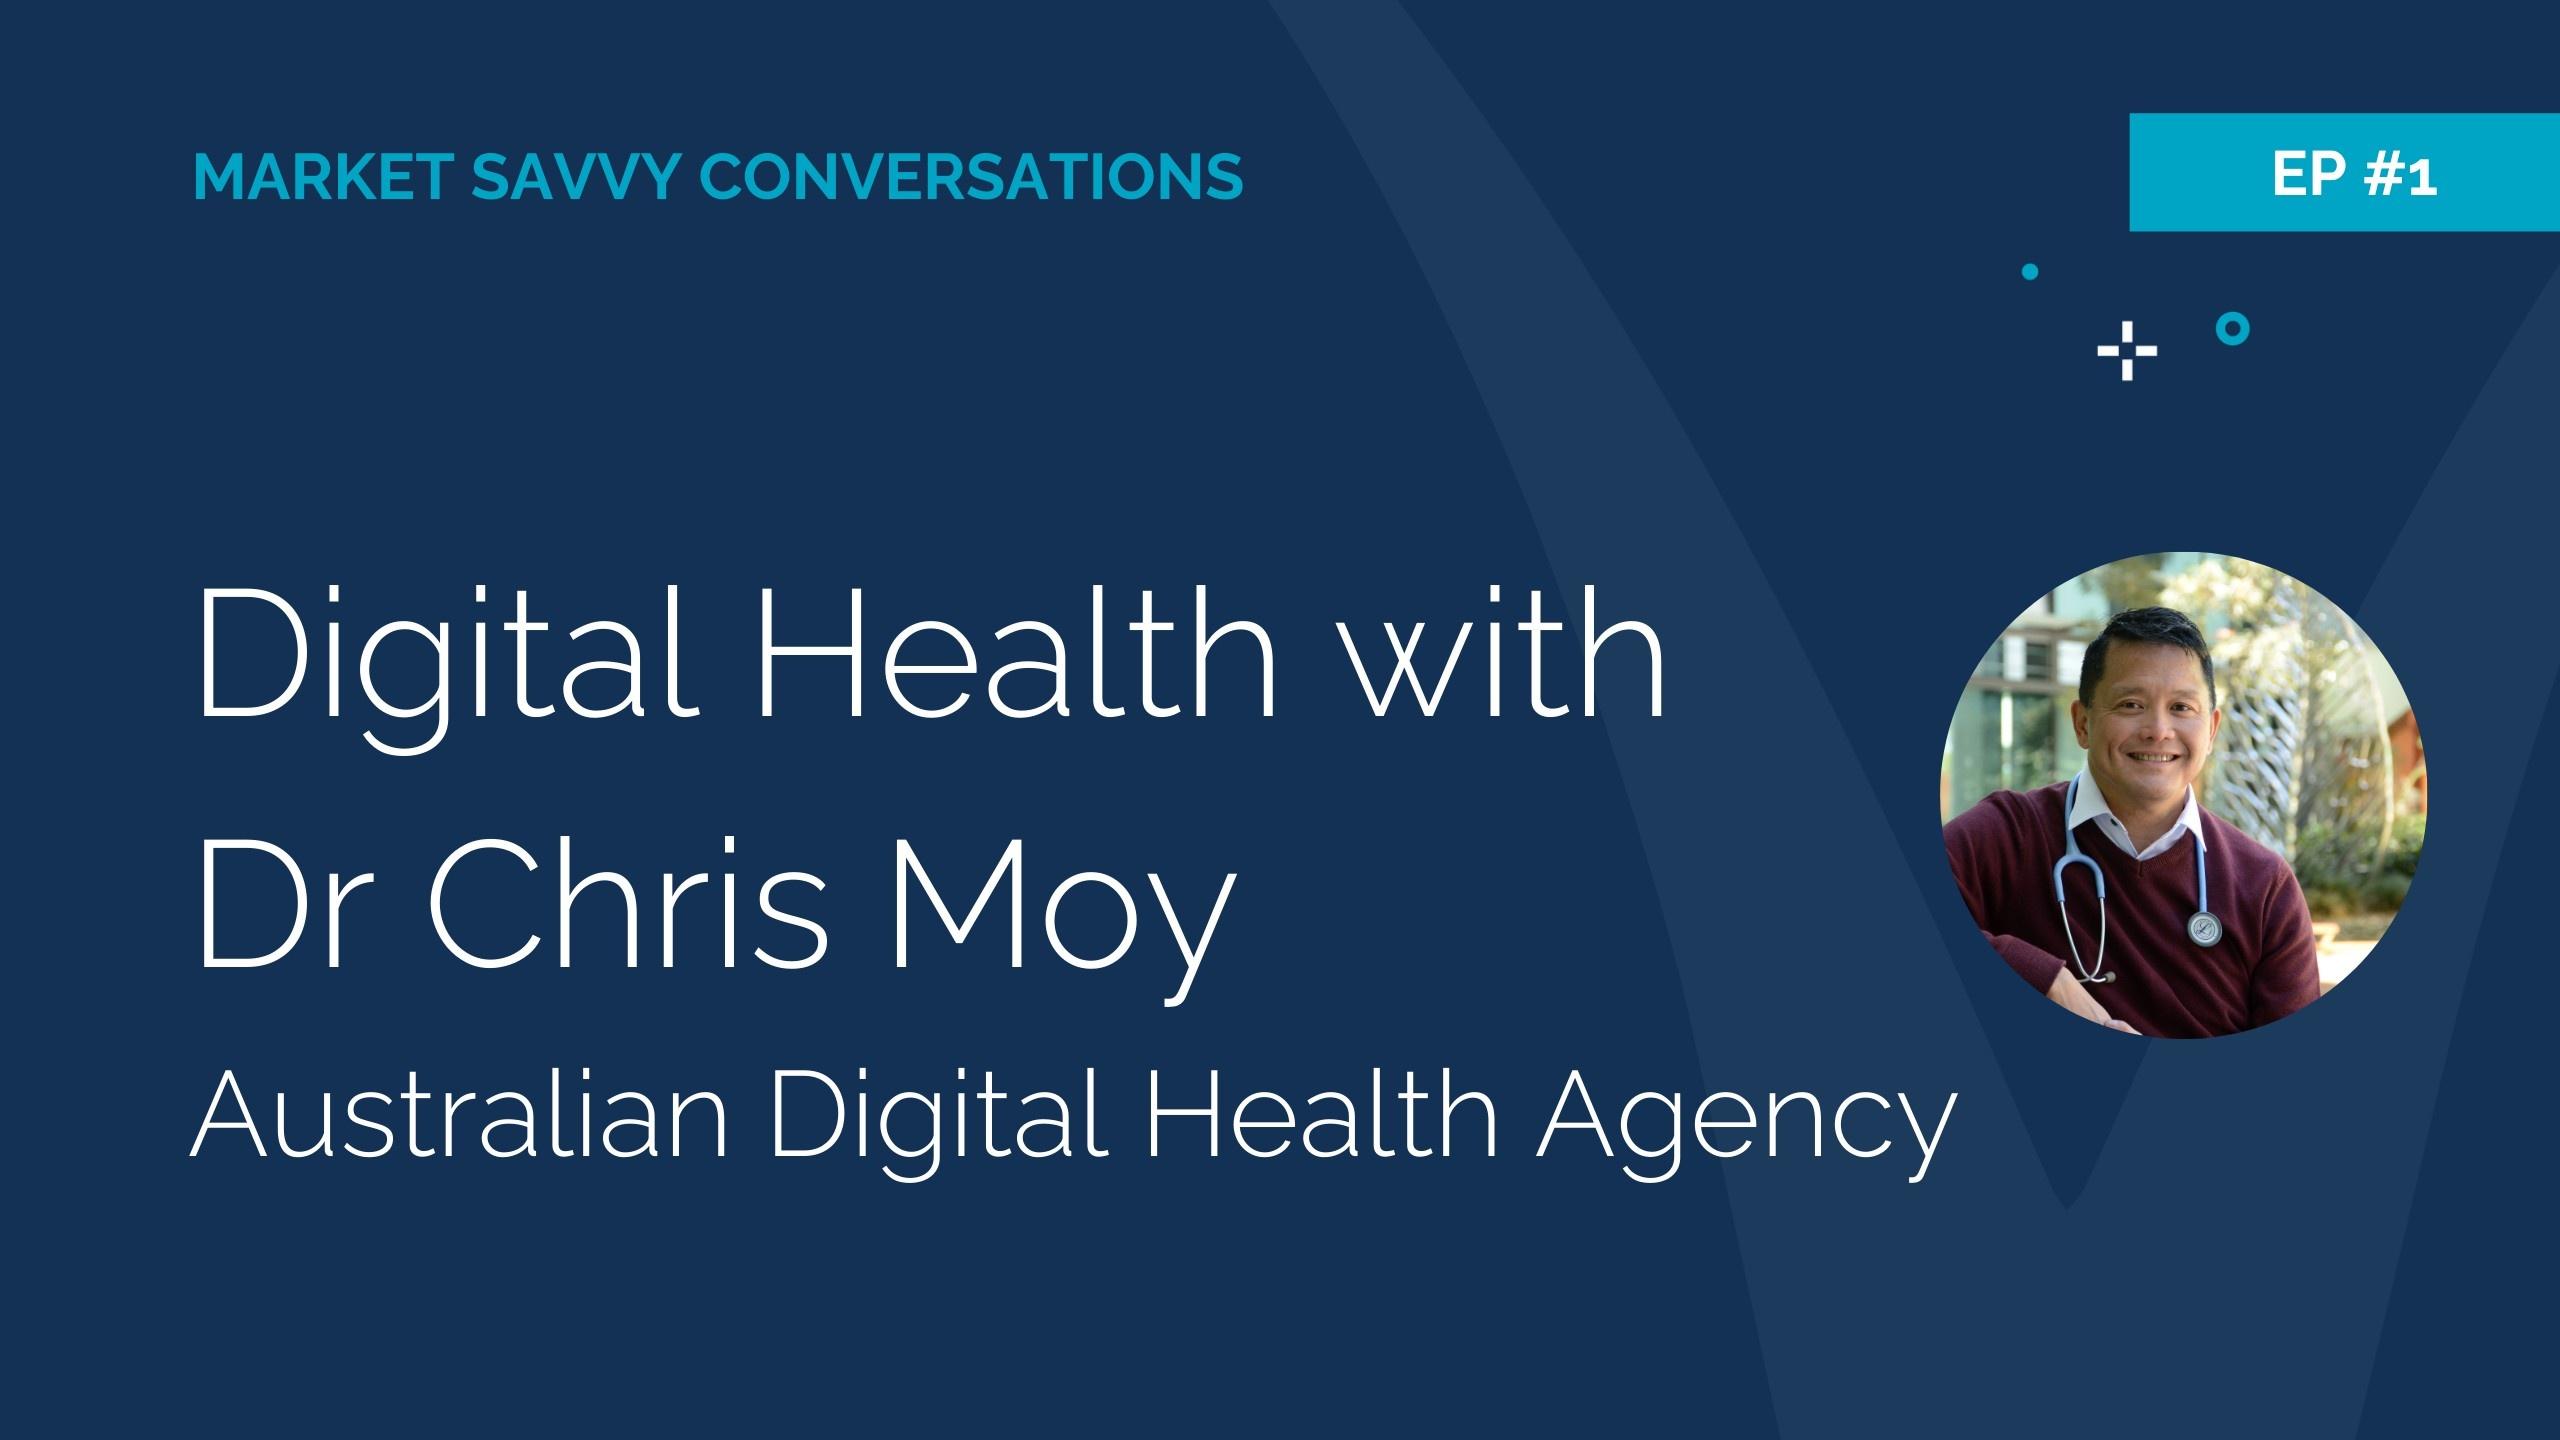 Dr Chris Moy Future of Digital Health Market Savvy podcast